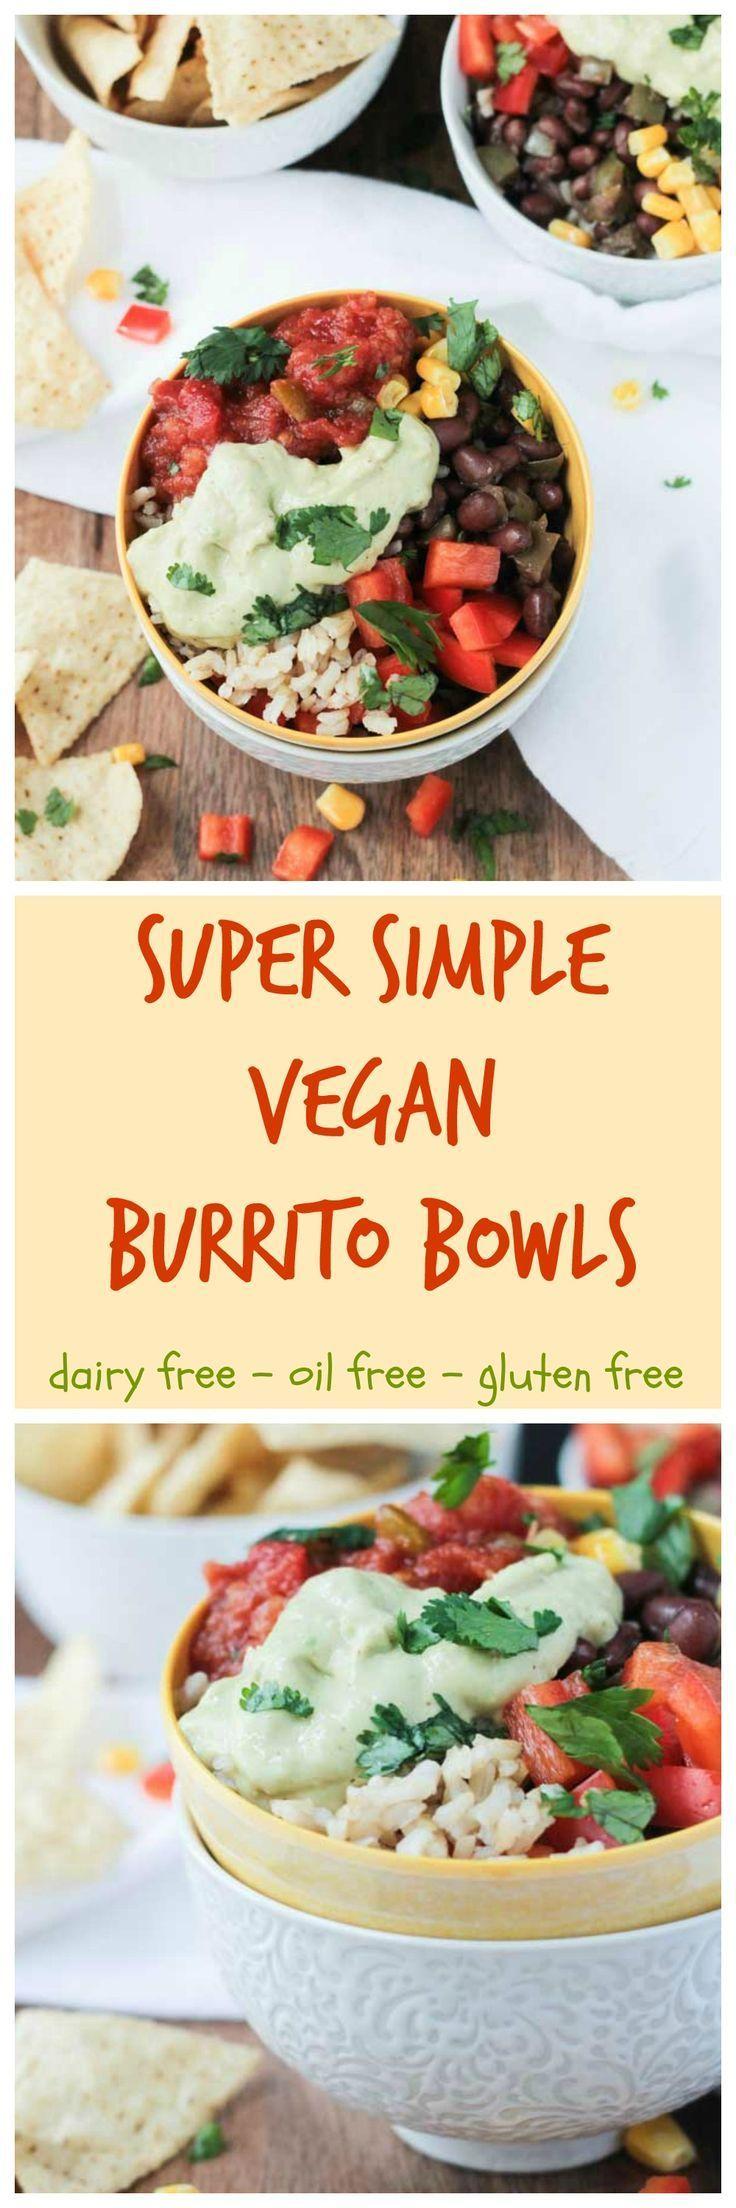 Super Simple Vegan Burrito Bowl - vegan   dairy free   oil free   gluten free   quick and easy   black beans   red pepper   avocado   brown rice   cilantro